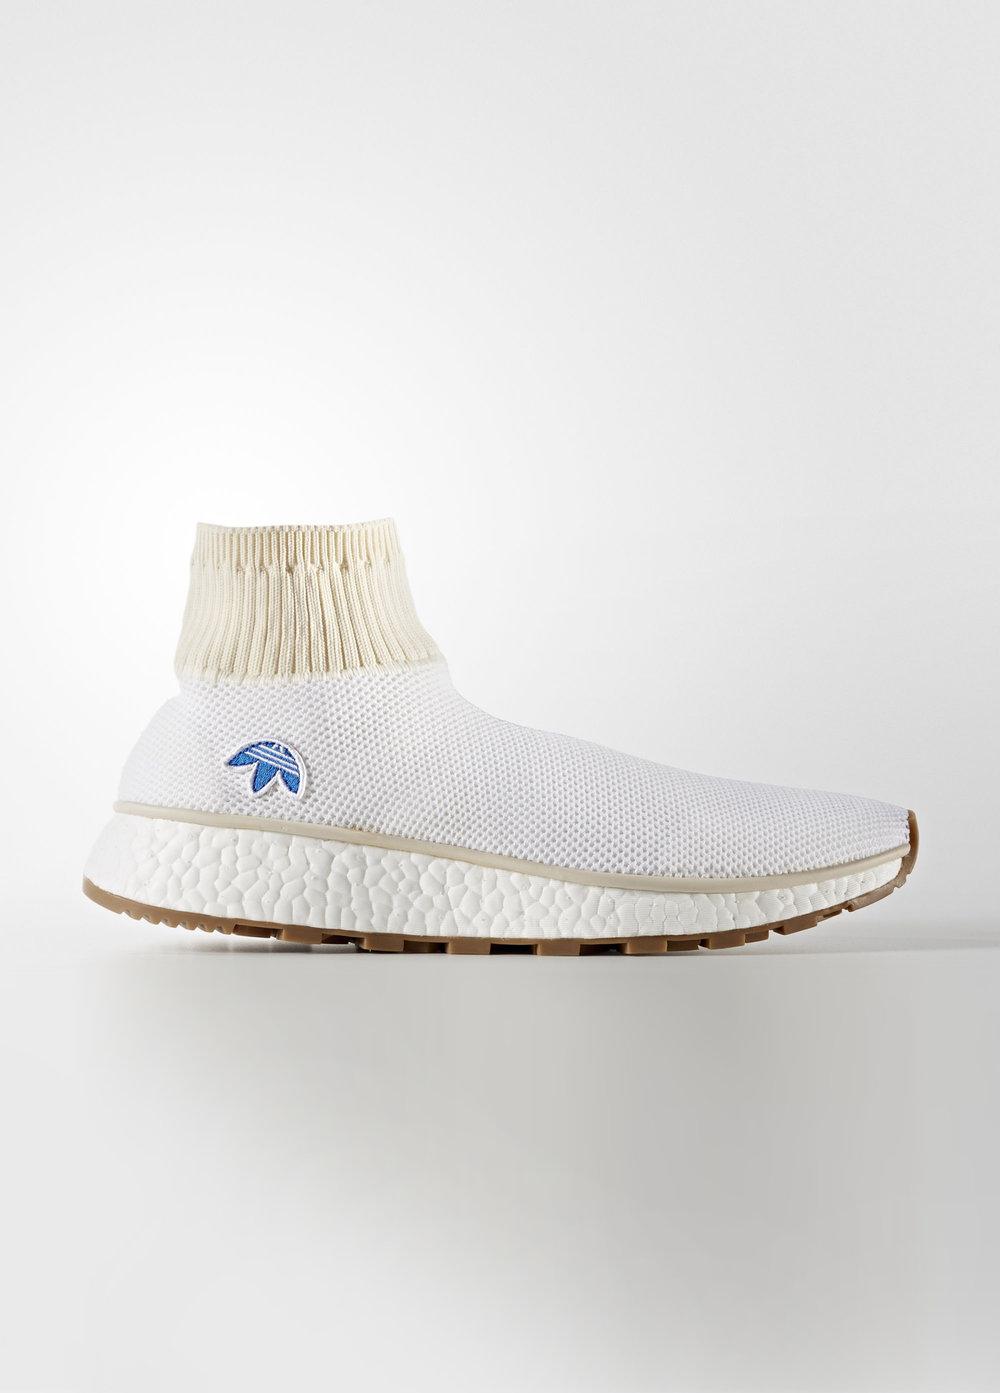 Adidas X Alexander Wang run clean shoes